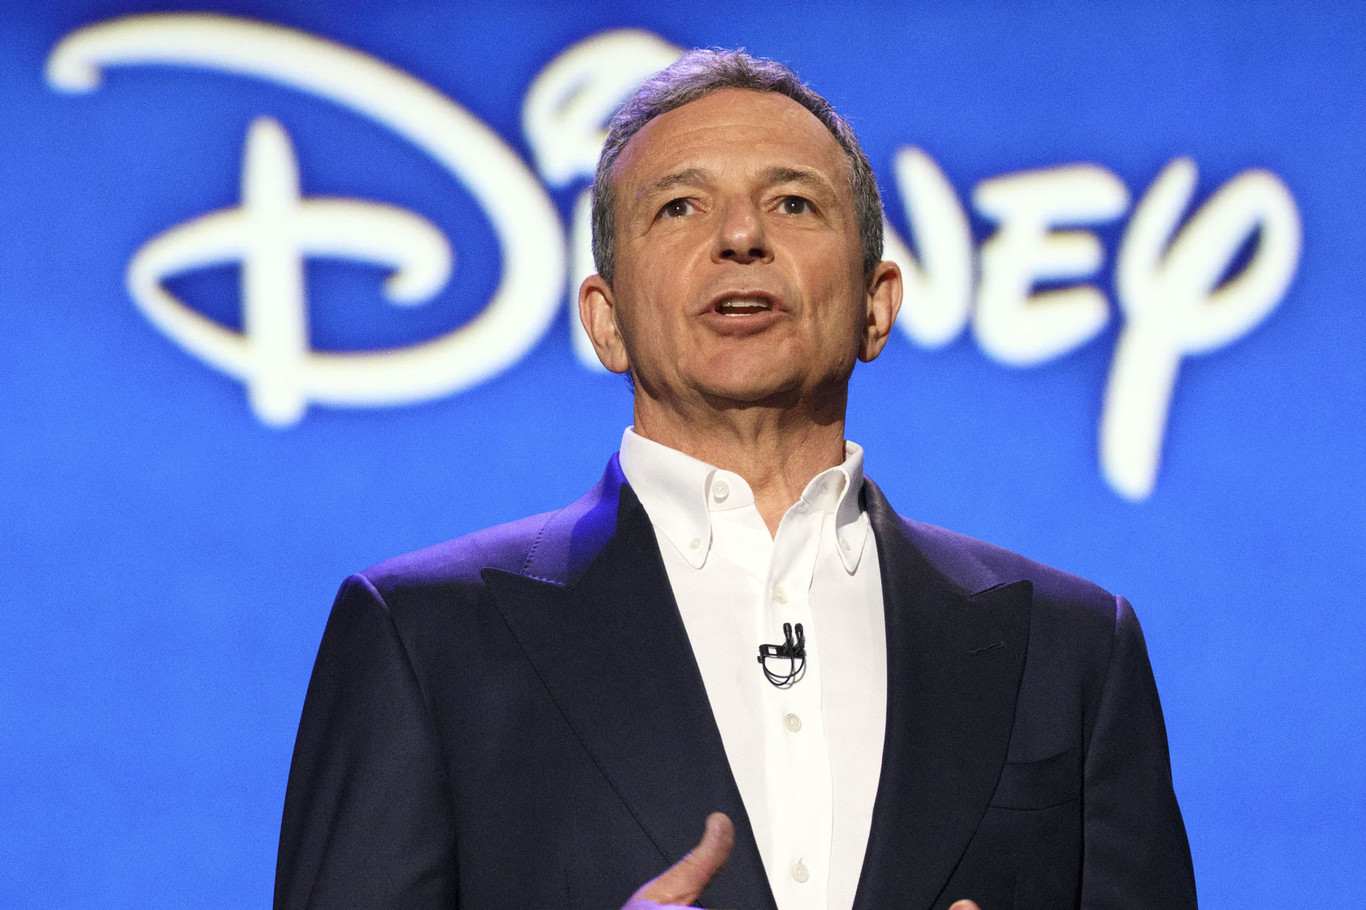 Bob Iger, CEO de Disney, abandona la junta directiva de Apple